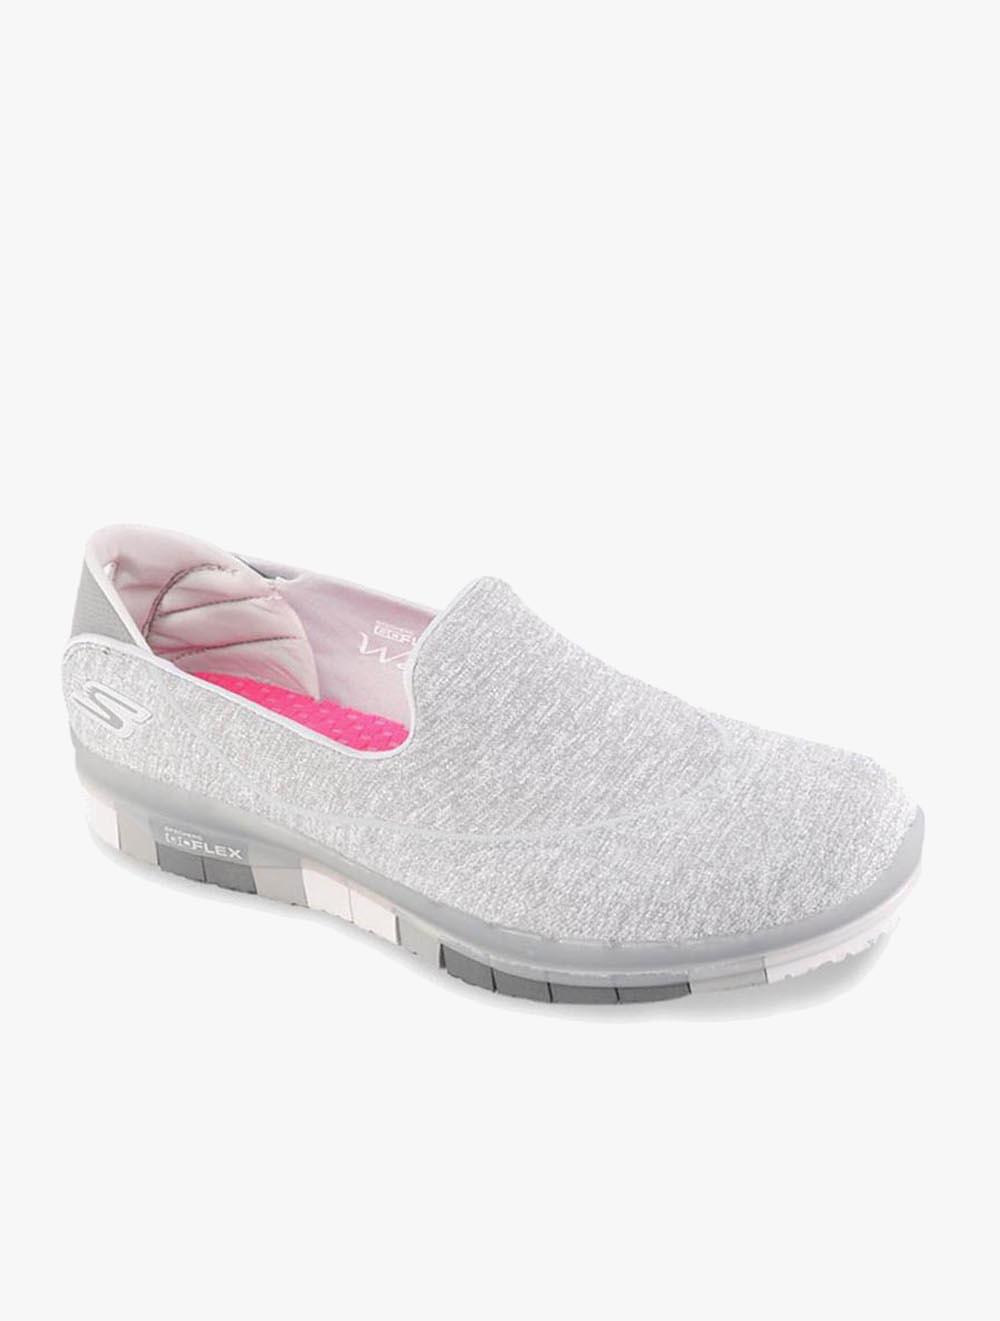 skechers go flex noir lifestyle chaussures